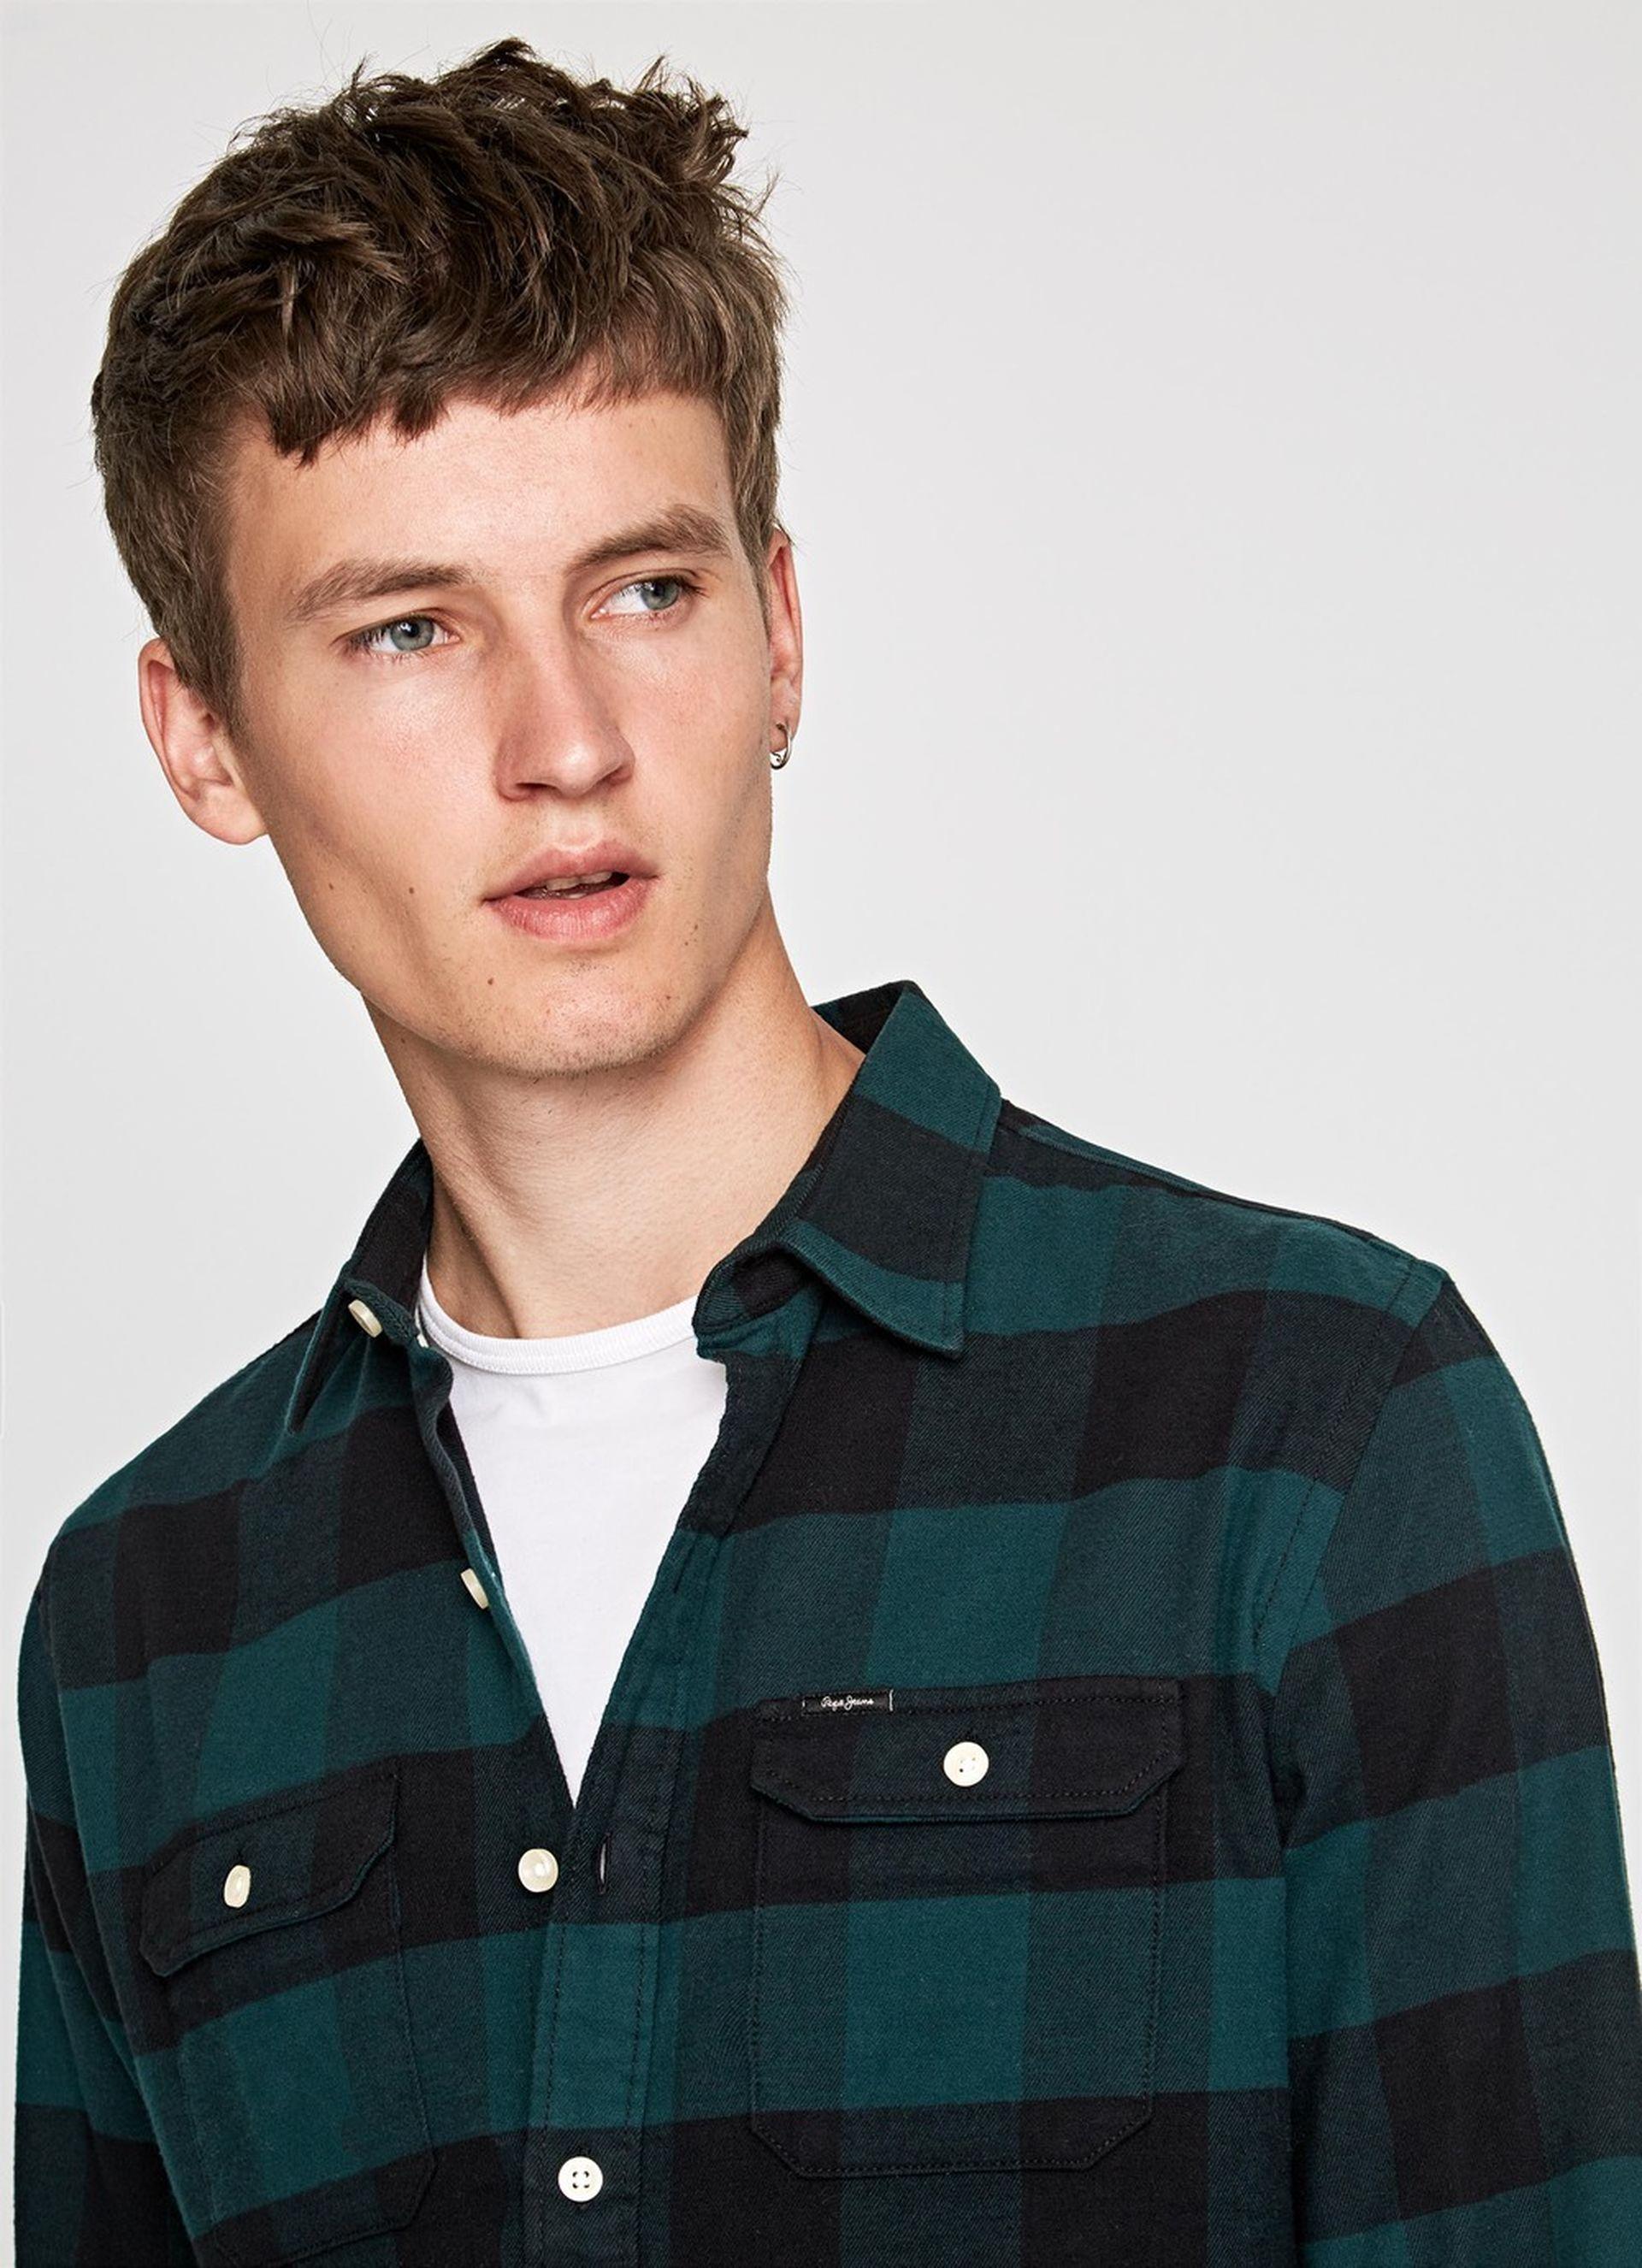 f6ad1a3252a4 PM305477 681 07 MO 1000Wx1000H. €70.00 Sale  €49.00. Καρό ανδρικό  μακρυμάνικο πουκάμισο Pepe Jeans ...